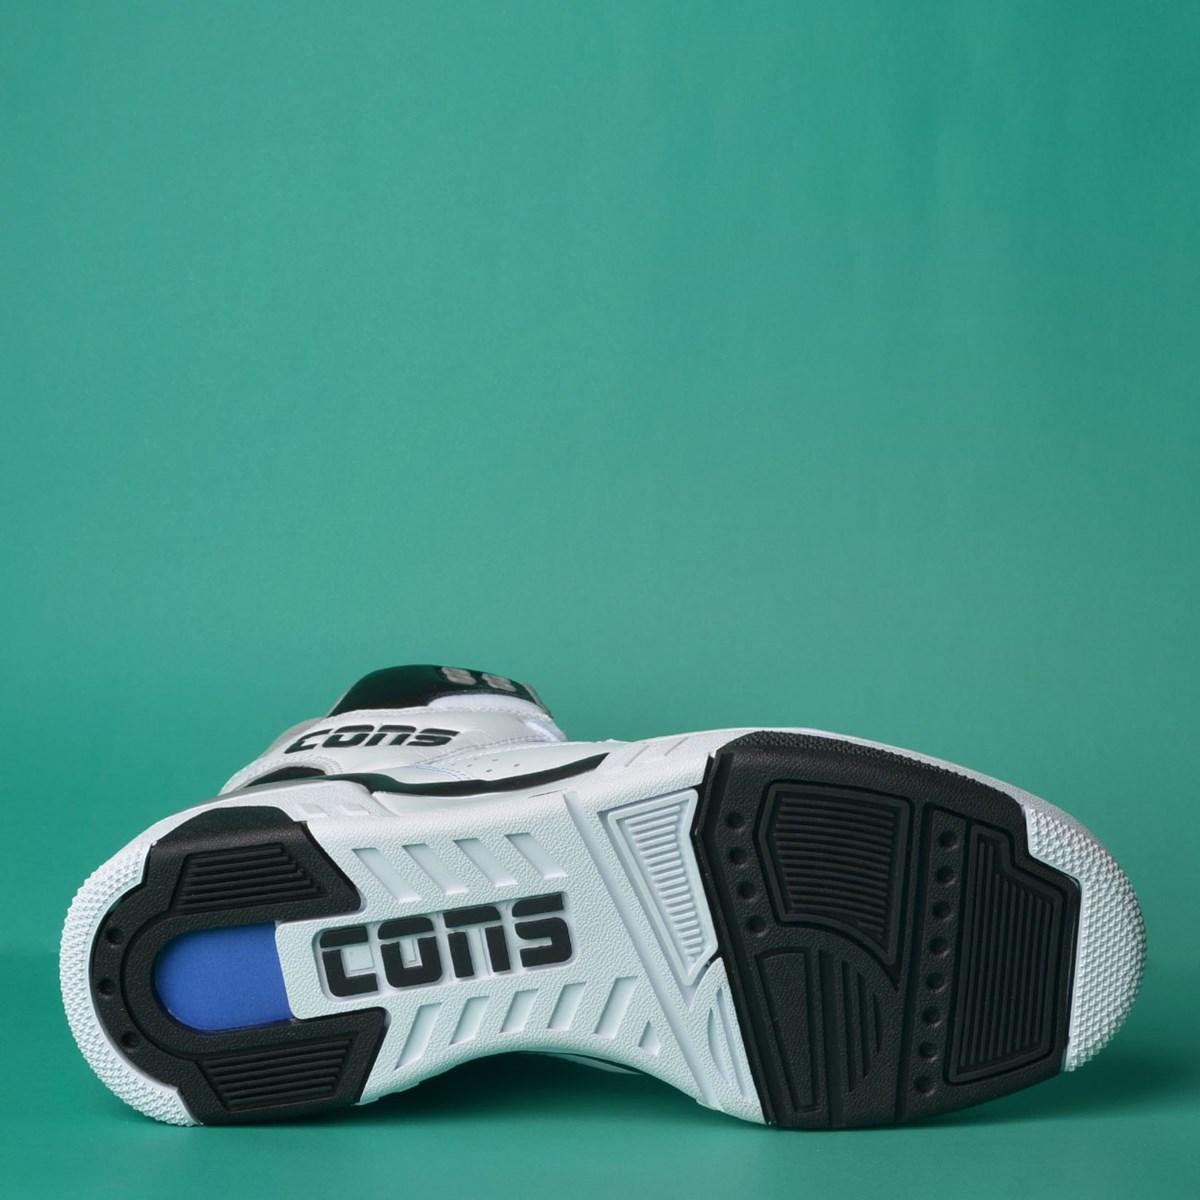 Tênis Converse ERX 260 Hi White Black Dolphin 165909C